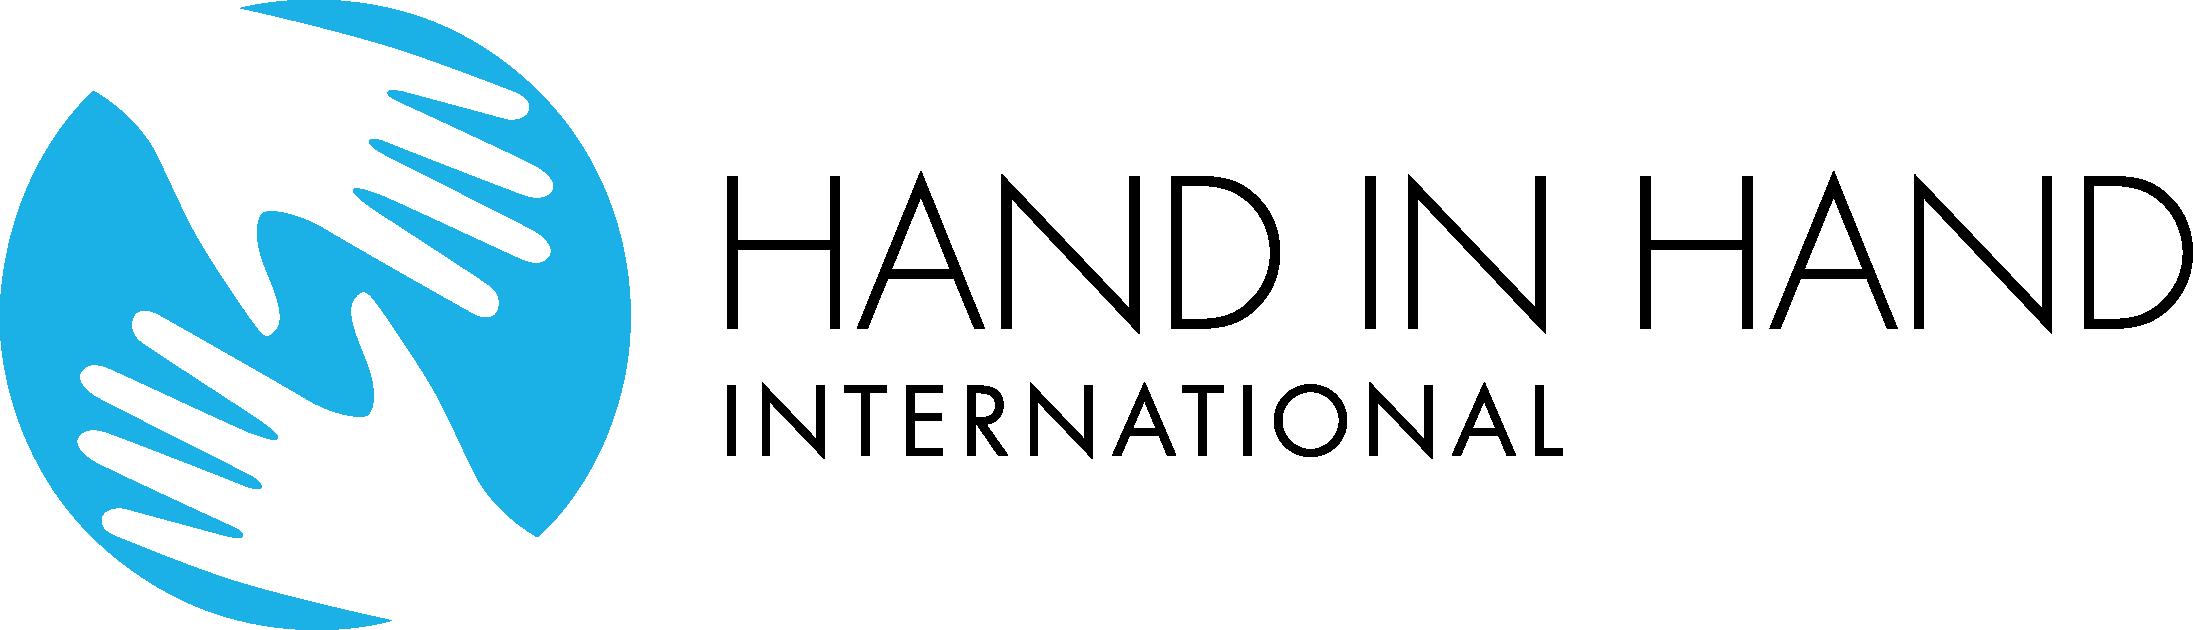 HiH-Intl-RGB-transparent